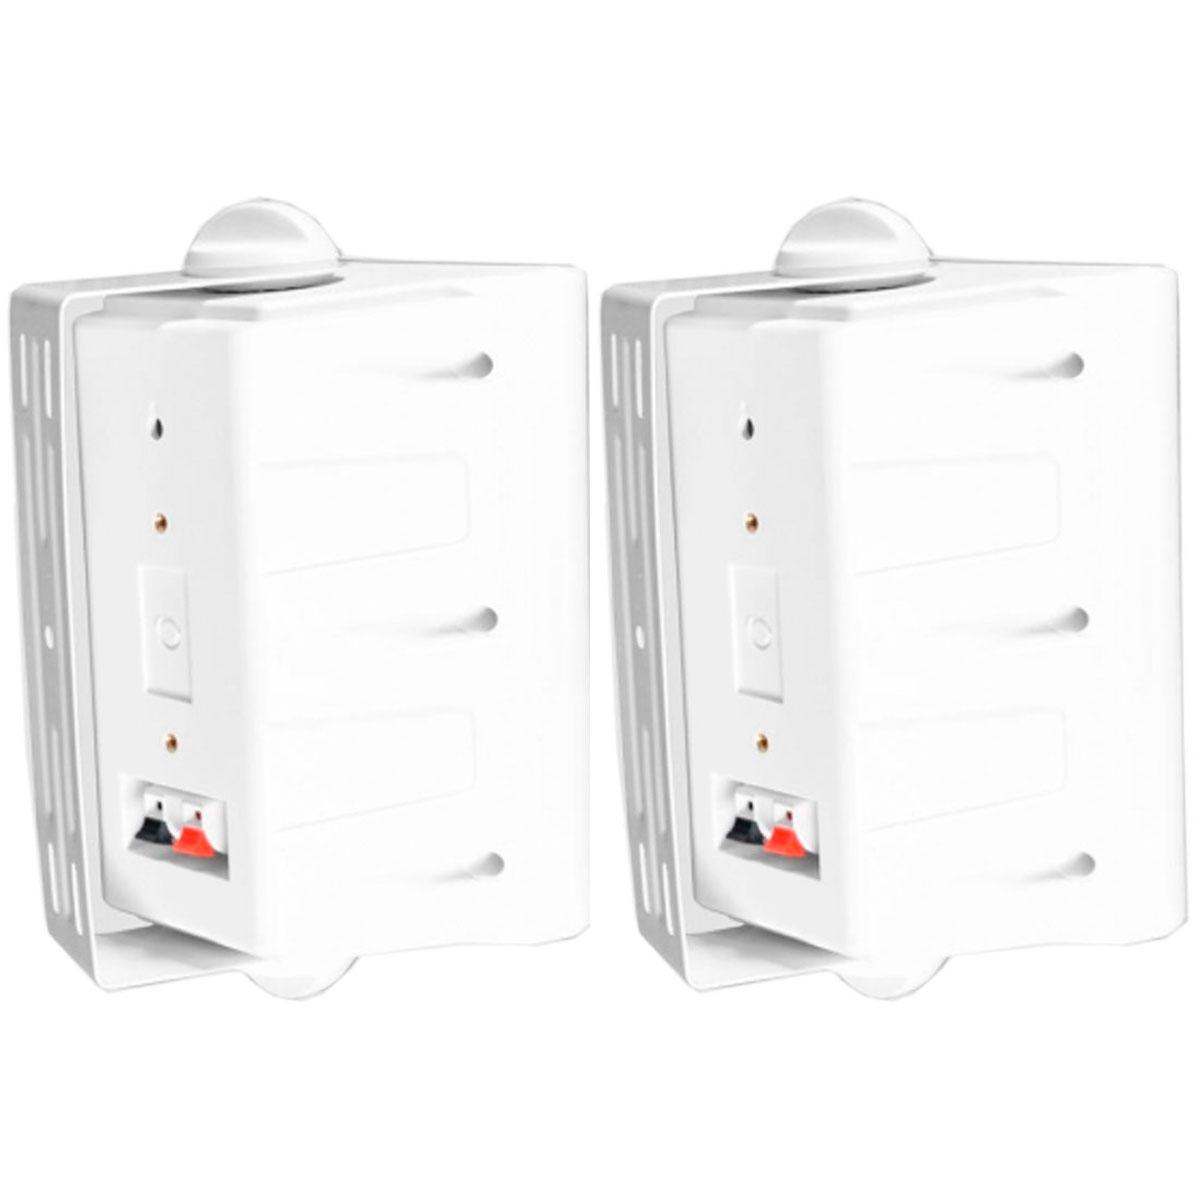 Caixa Passiva p/ Som Ambiente Fal 5 Pol 60W c/ Suporte (Par) - IT 50 Leacs